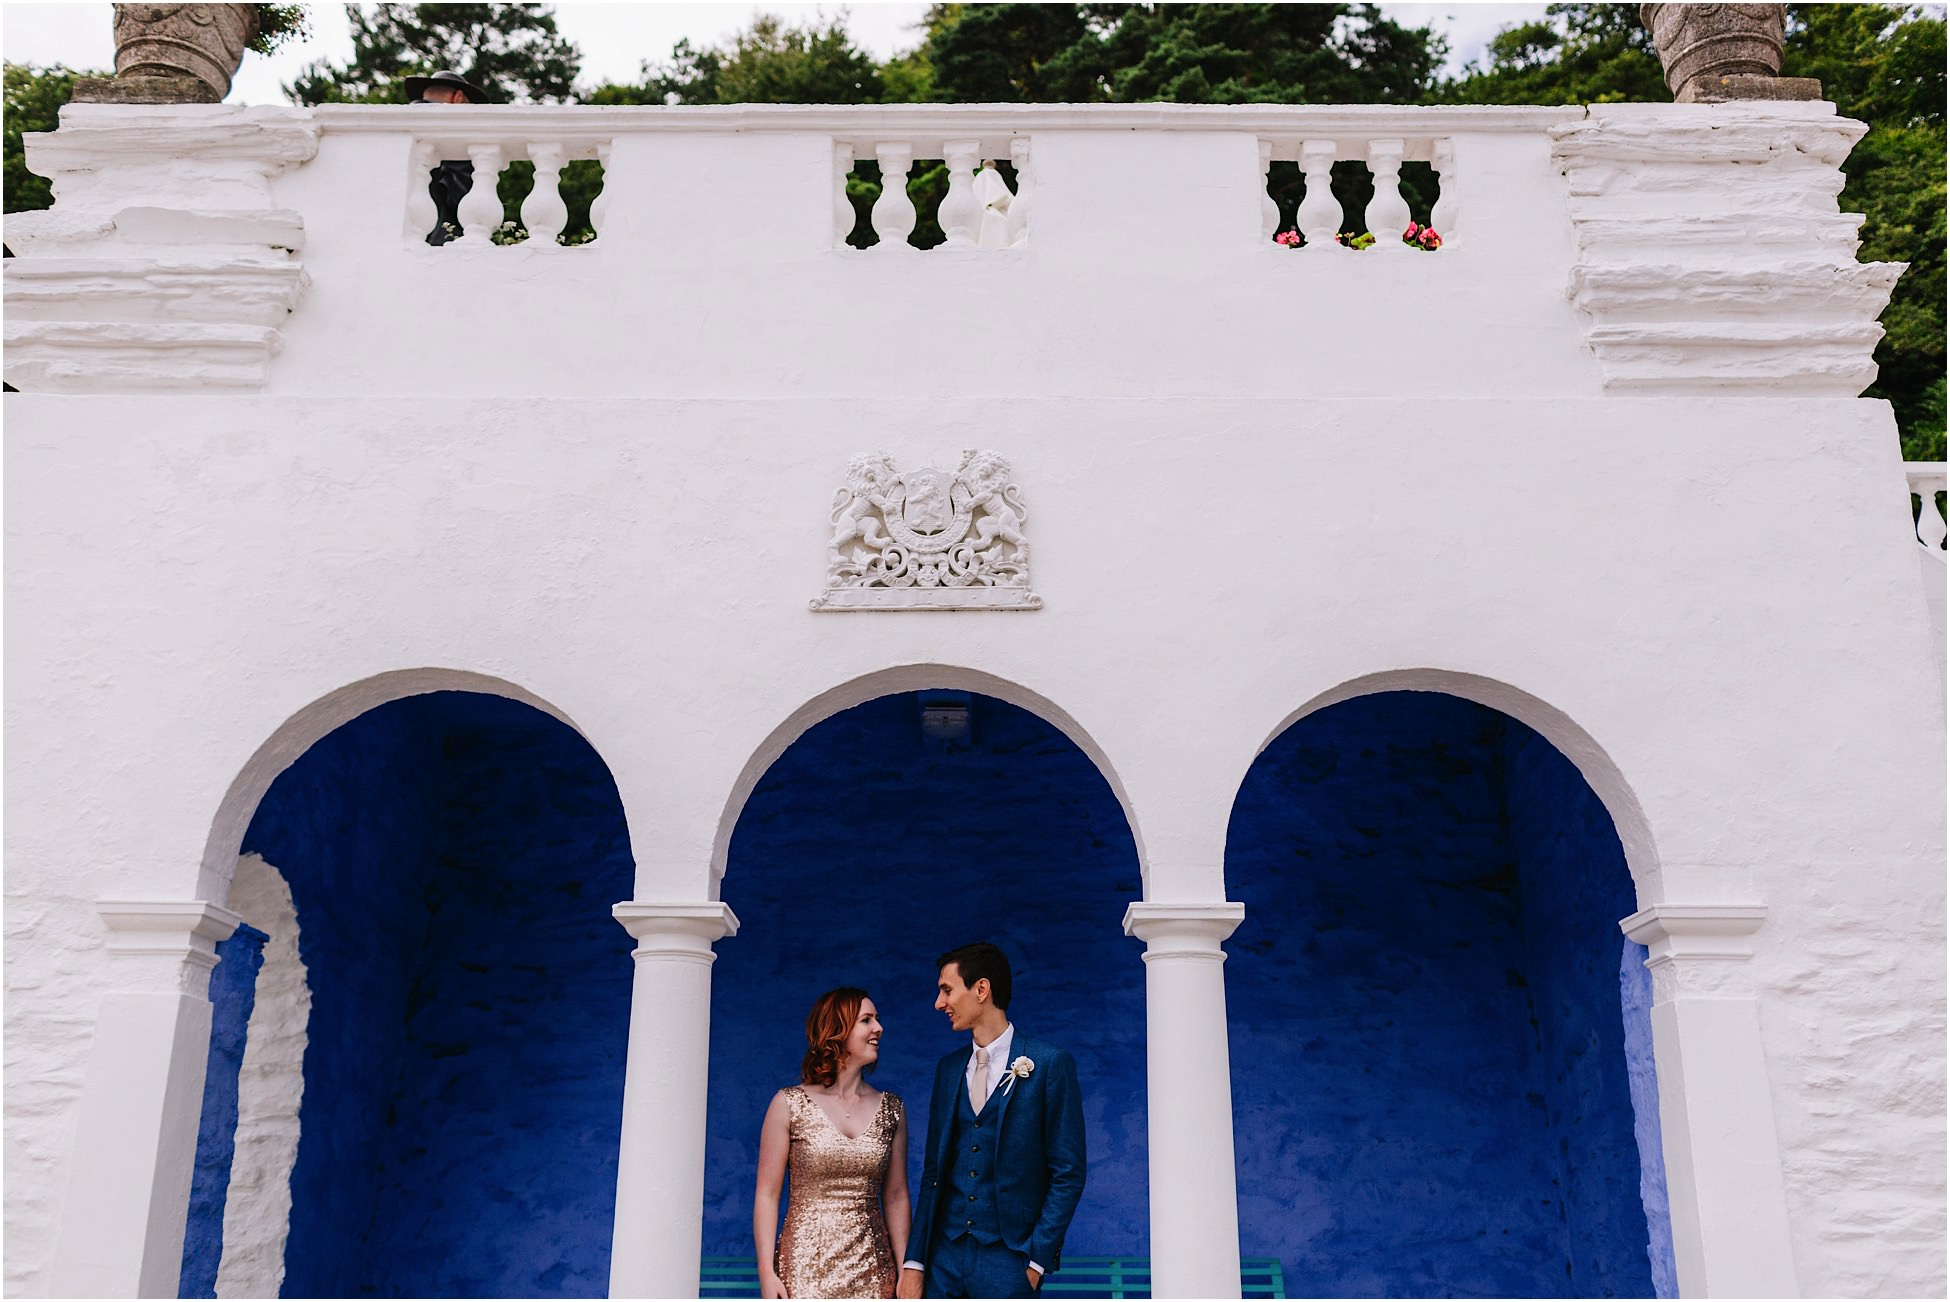 Portmeirion wedding photography – Ed and Charlotte